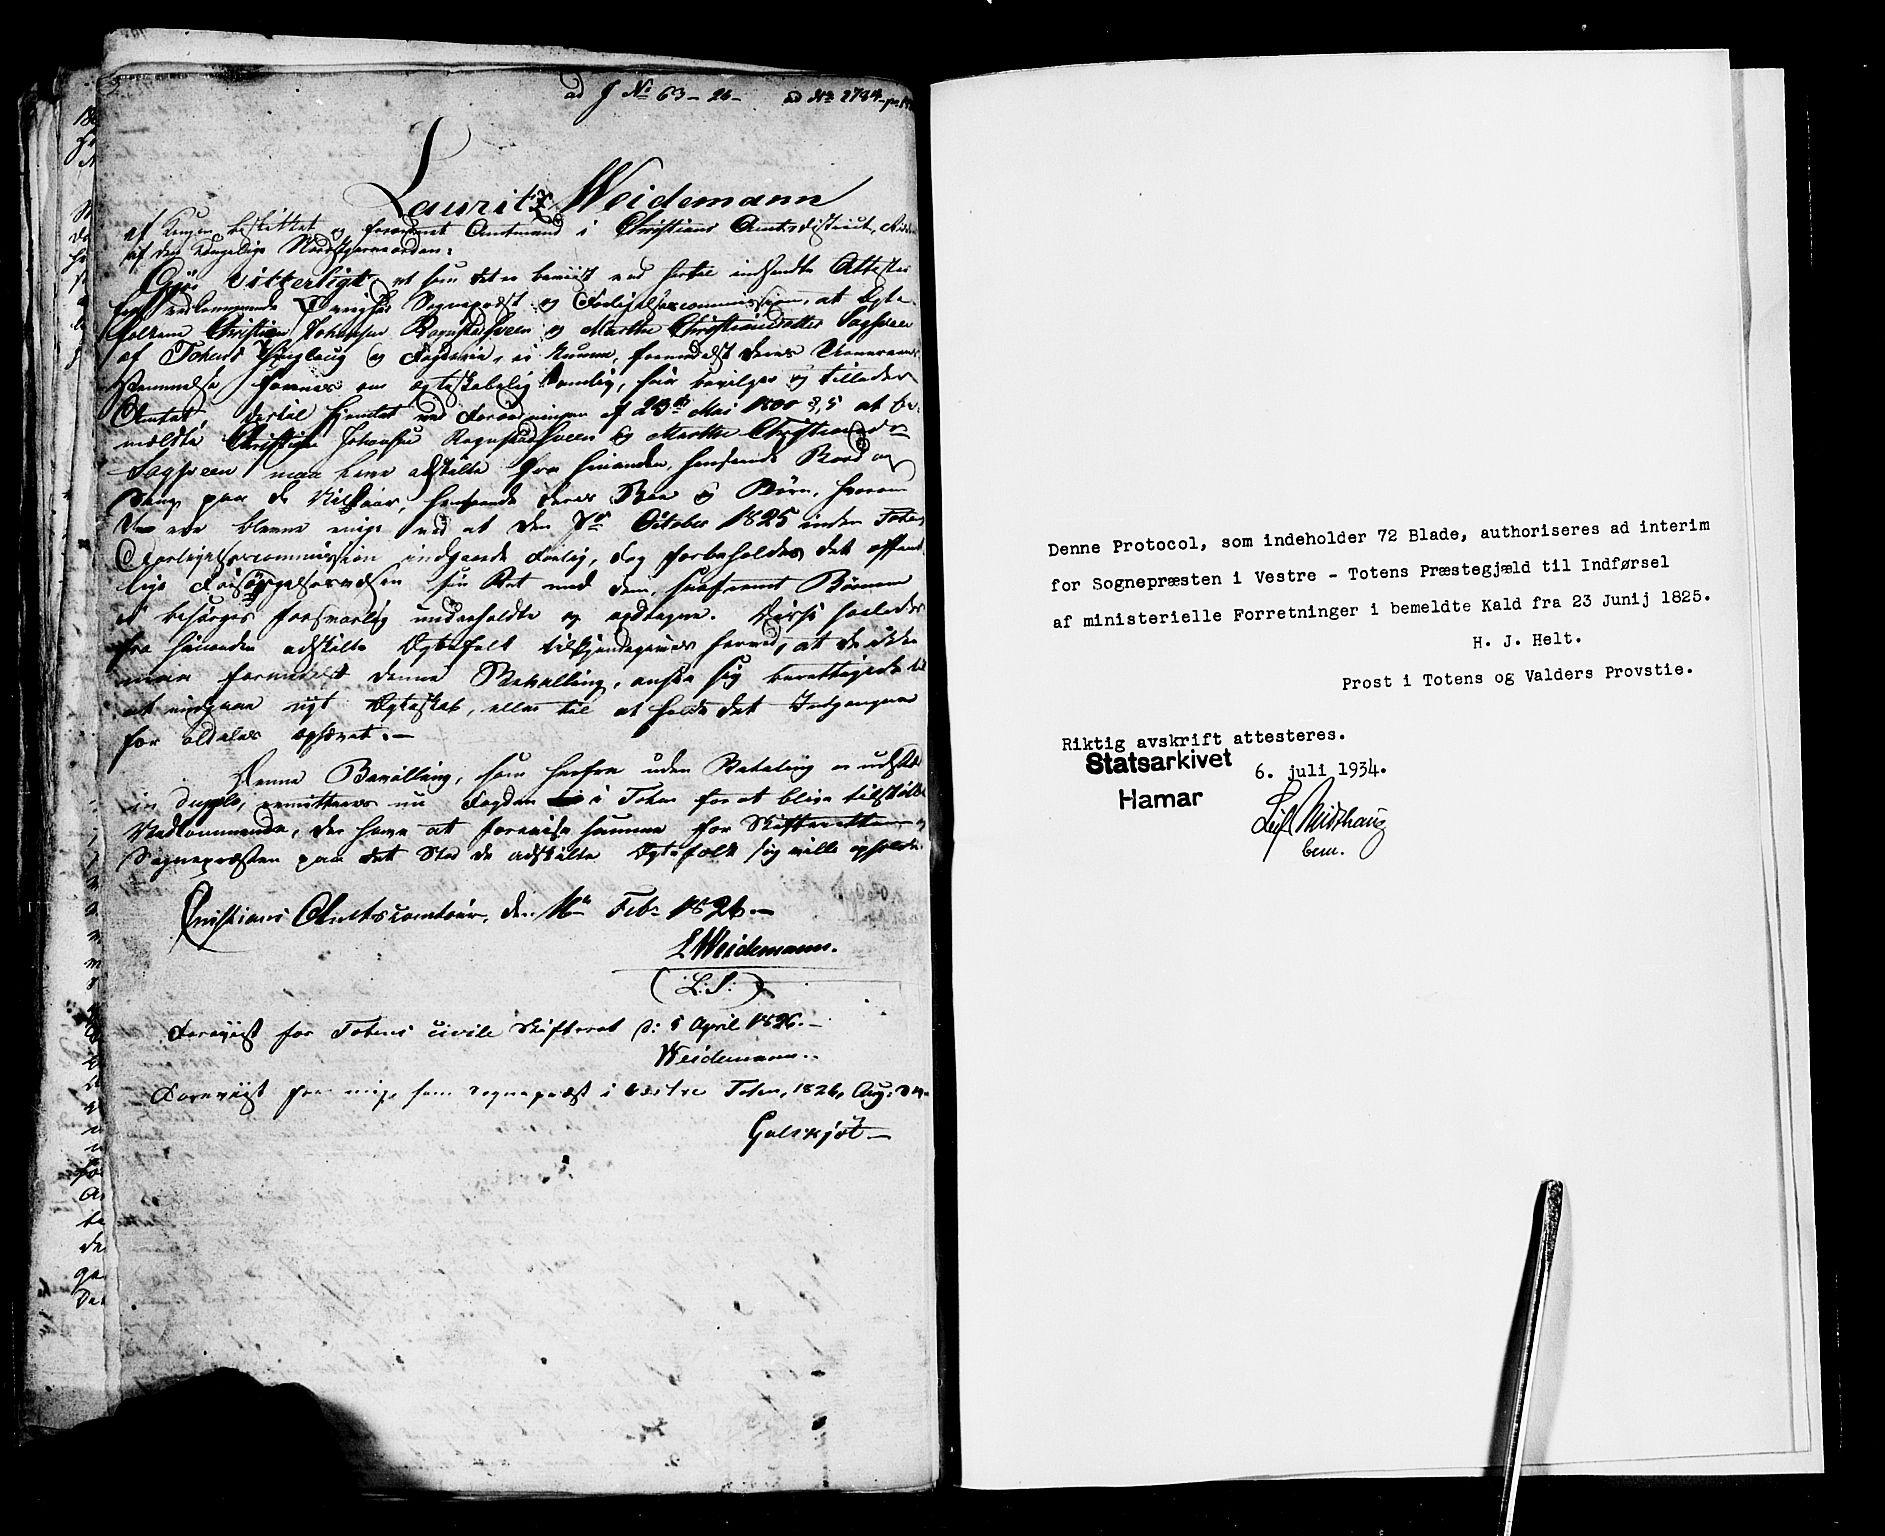 SAH, Vestre Toten prestekontor, Ministerialbok nr. 1, 1825-1826